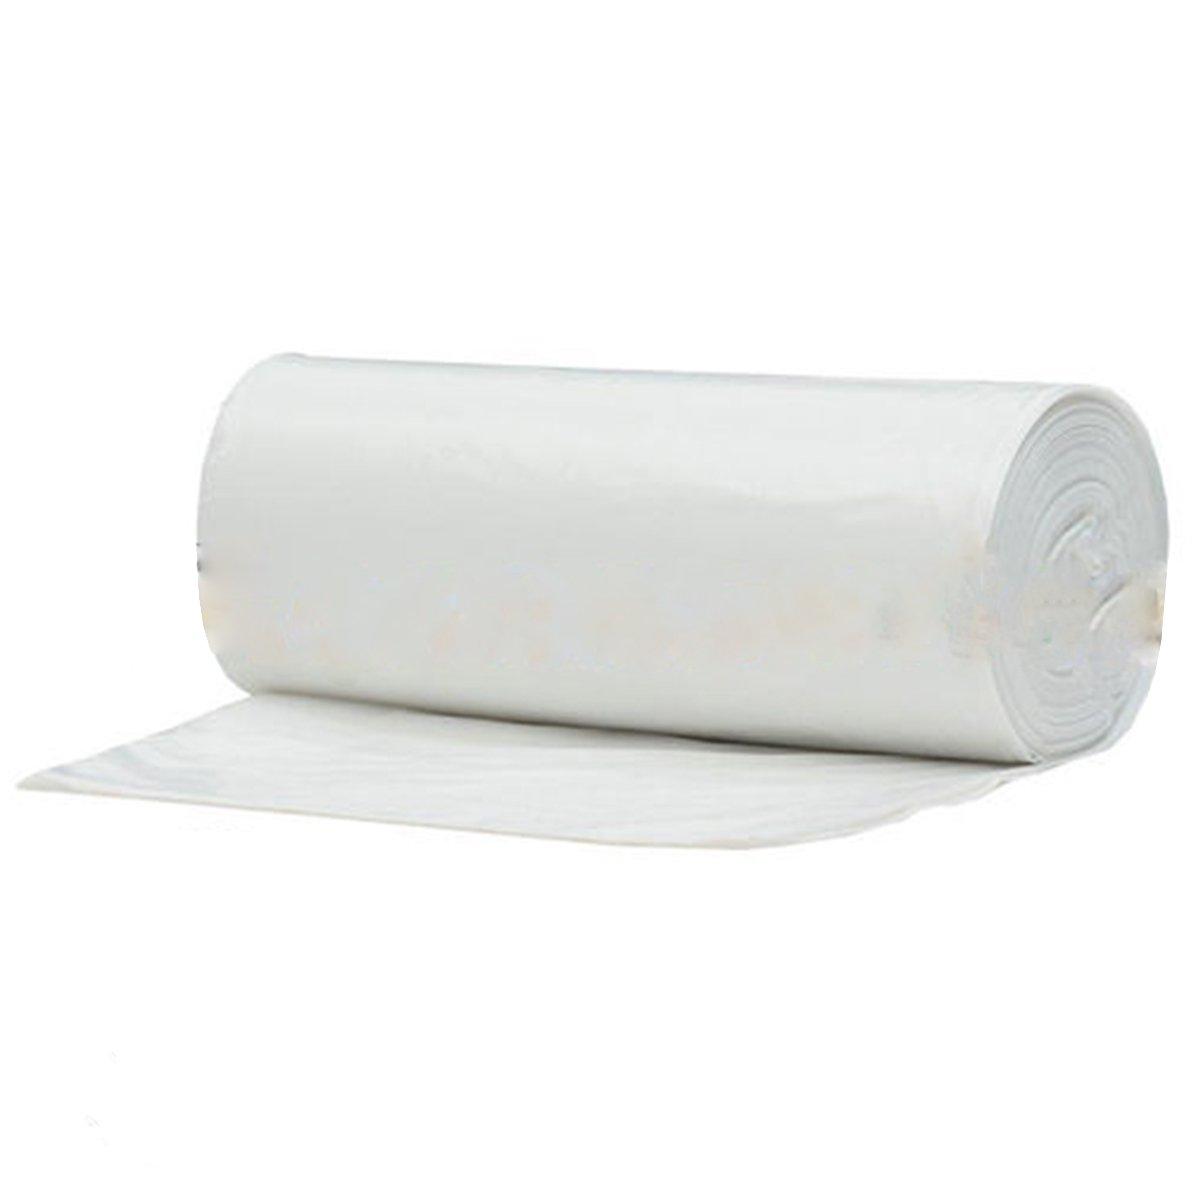 Cheap 55 Gallon Trash Bag, find 55 Gallon Trash Bag deals on line at ...